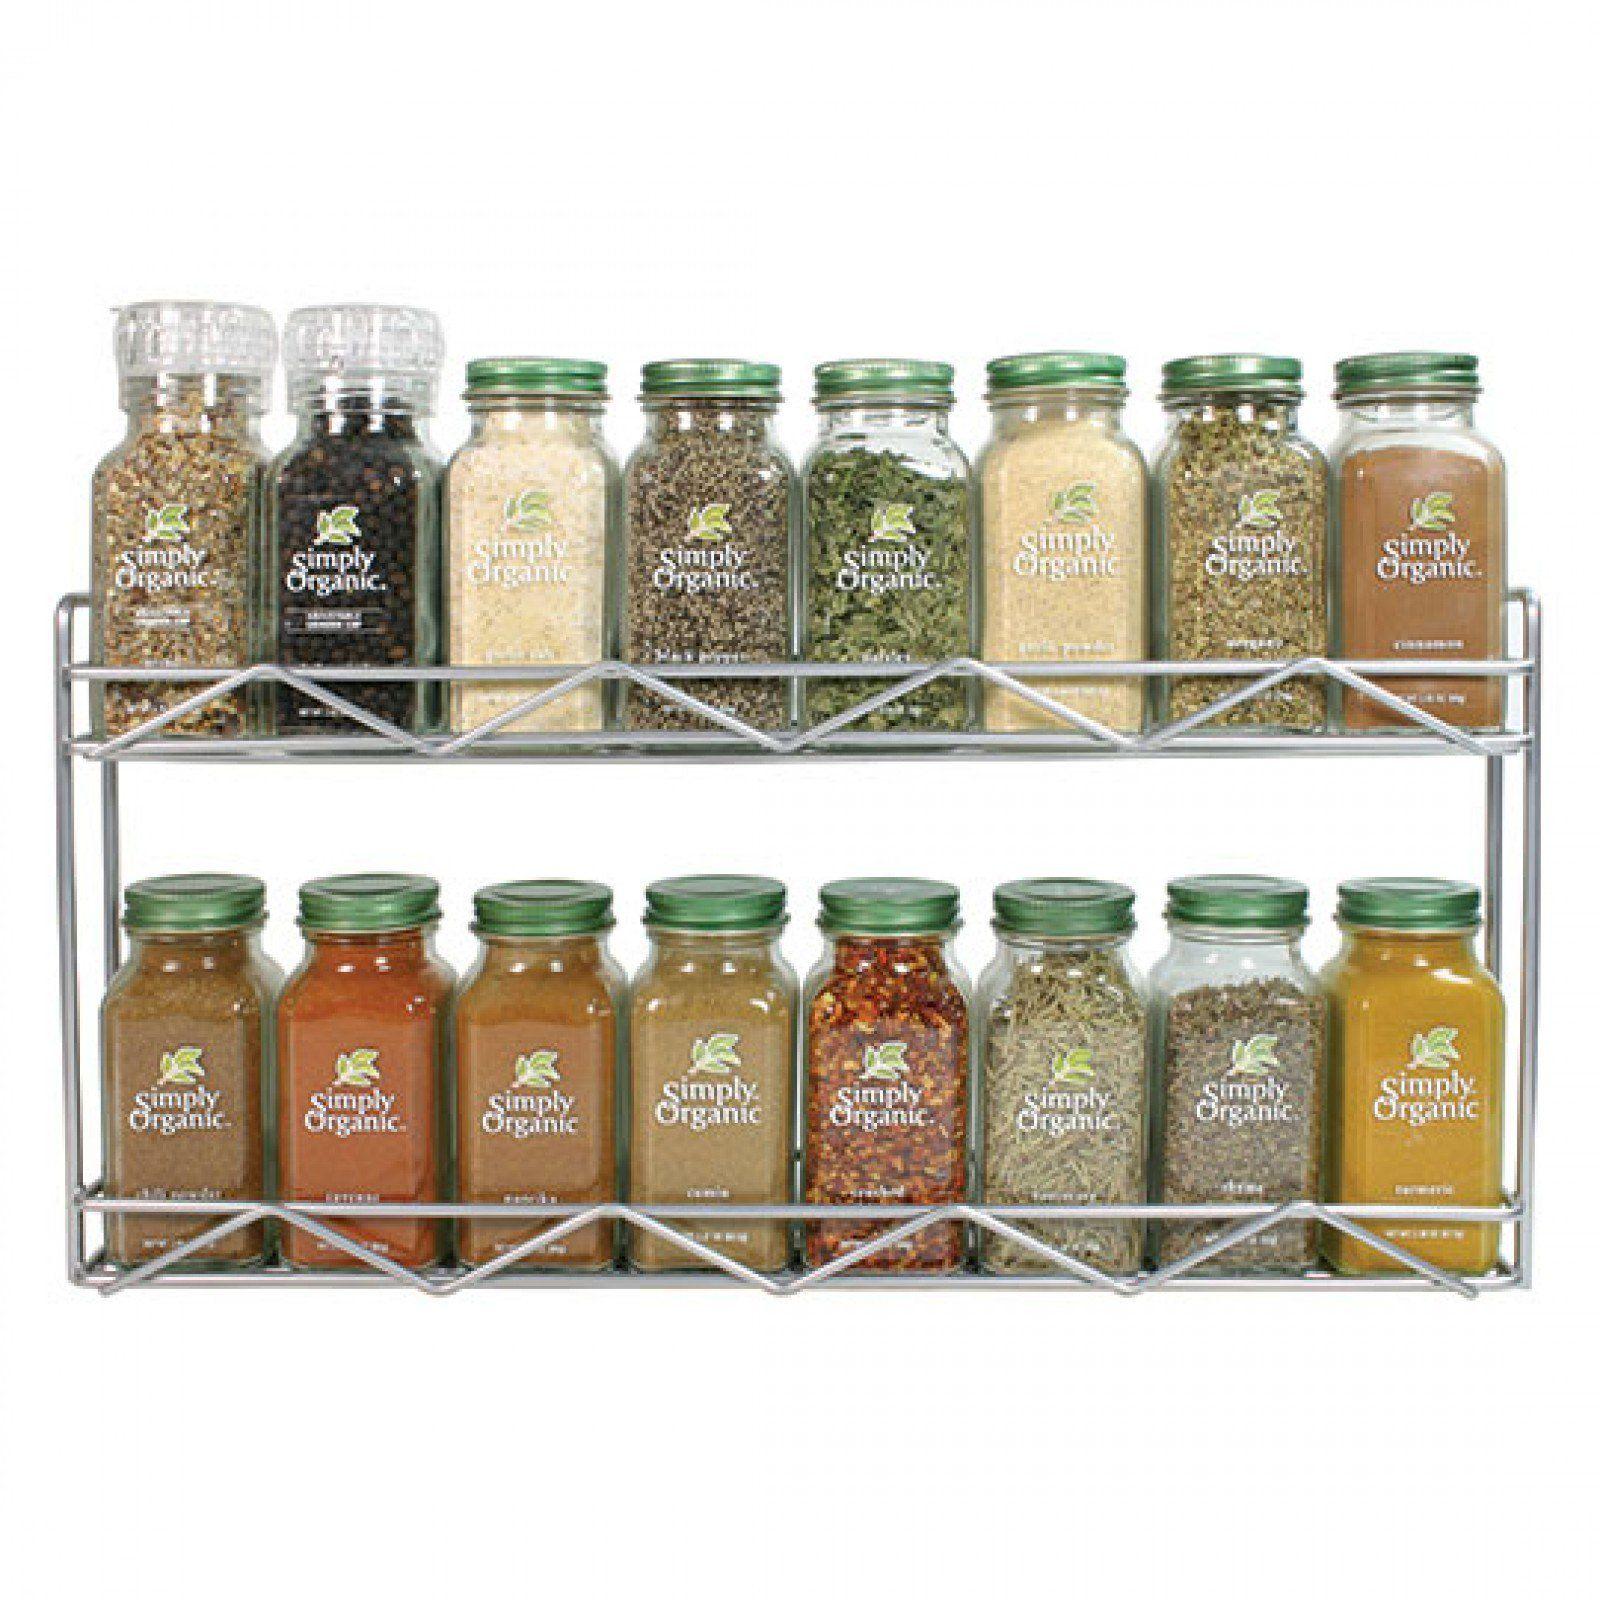 Organic Spice Rack Simply Organic 16Count Spice Rack  Simply Organic  Christmas